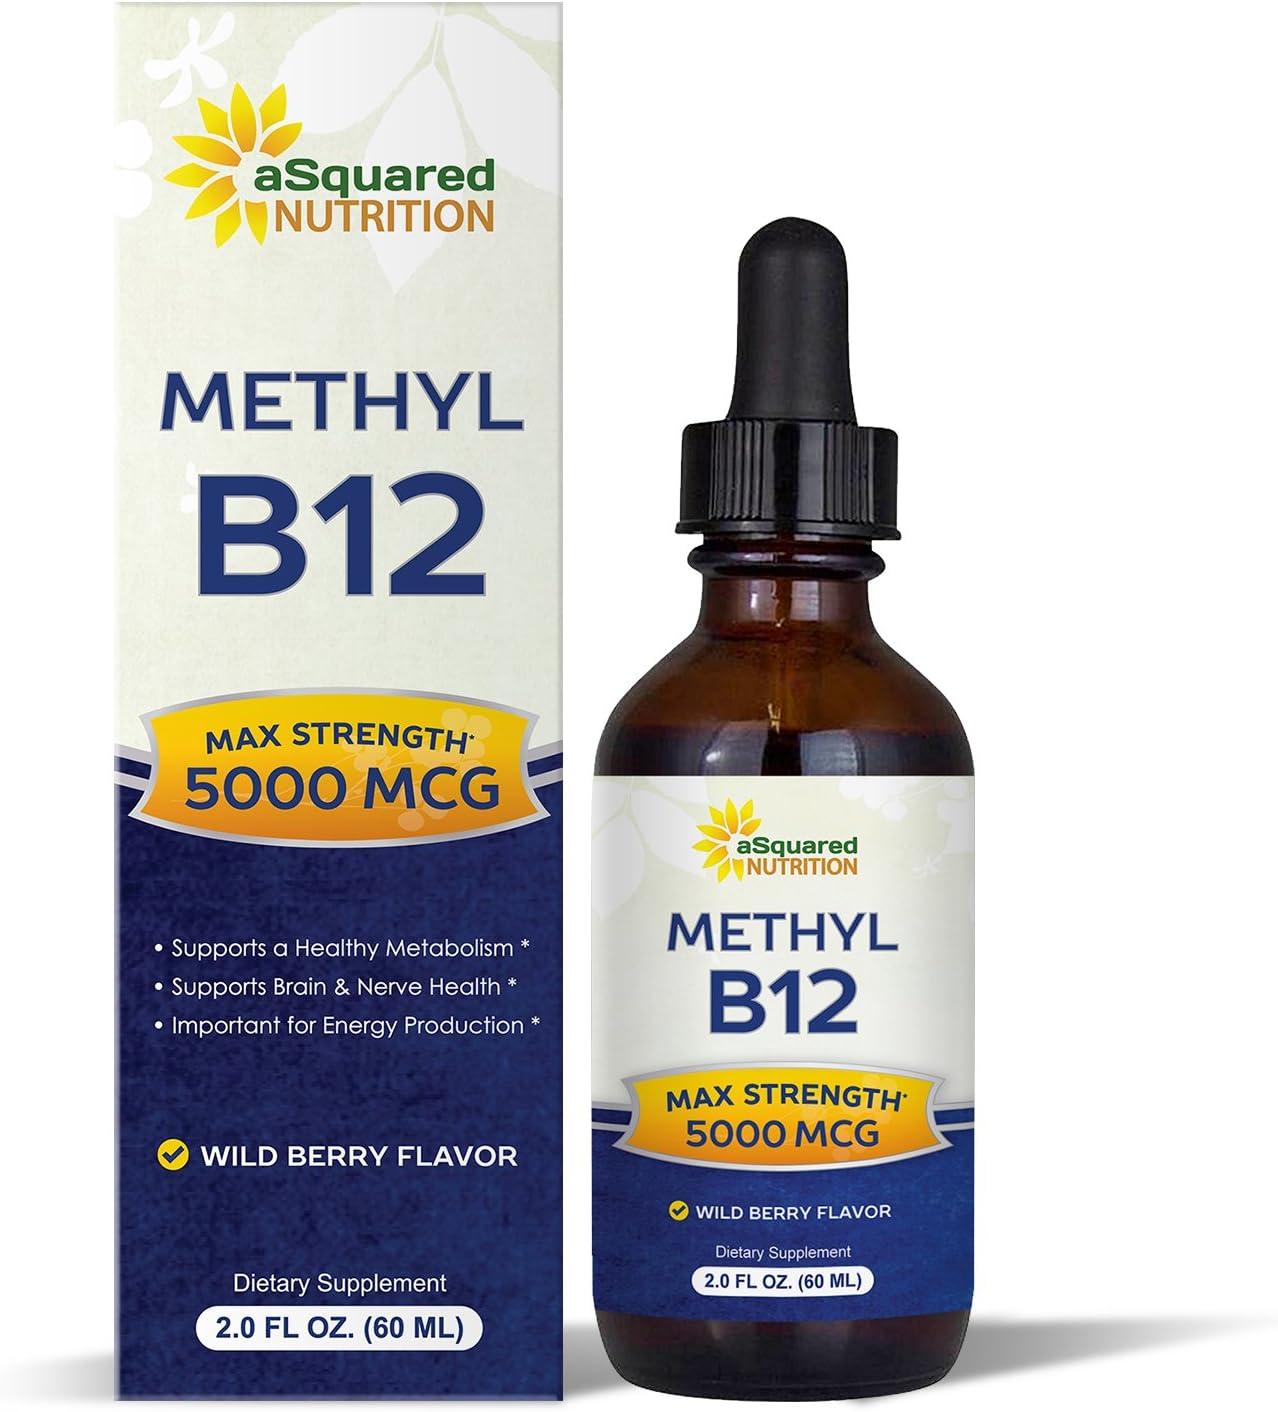 Vitamin B12 Sublingual Liquid Drops – 5000 MCG Supplement with Methylcobalamin Methyl B-12 – Max Absorption B 12 to Increase Energy Metabolism – Vegan Friendly – 2 fl oz